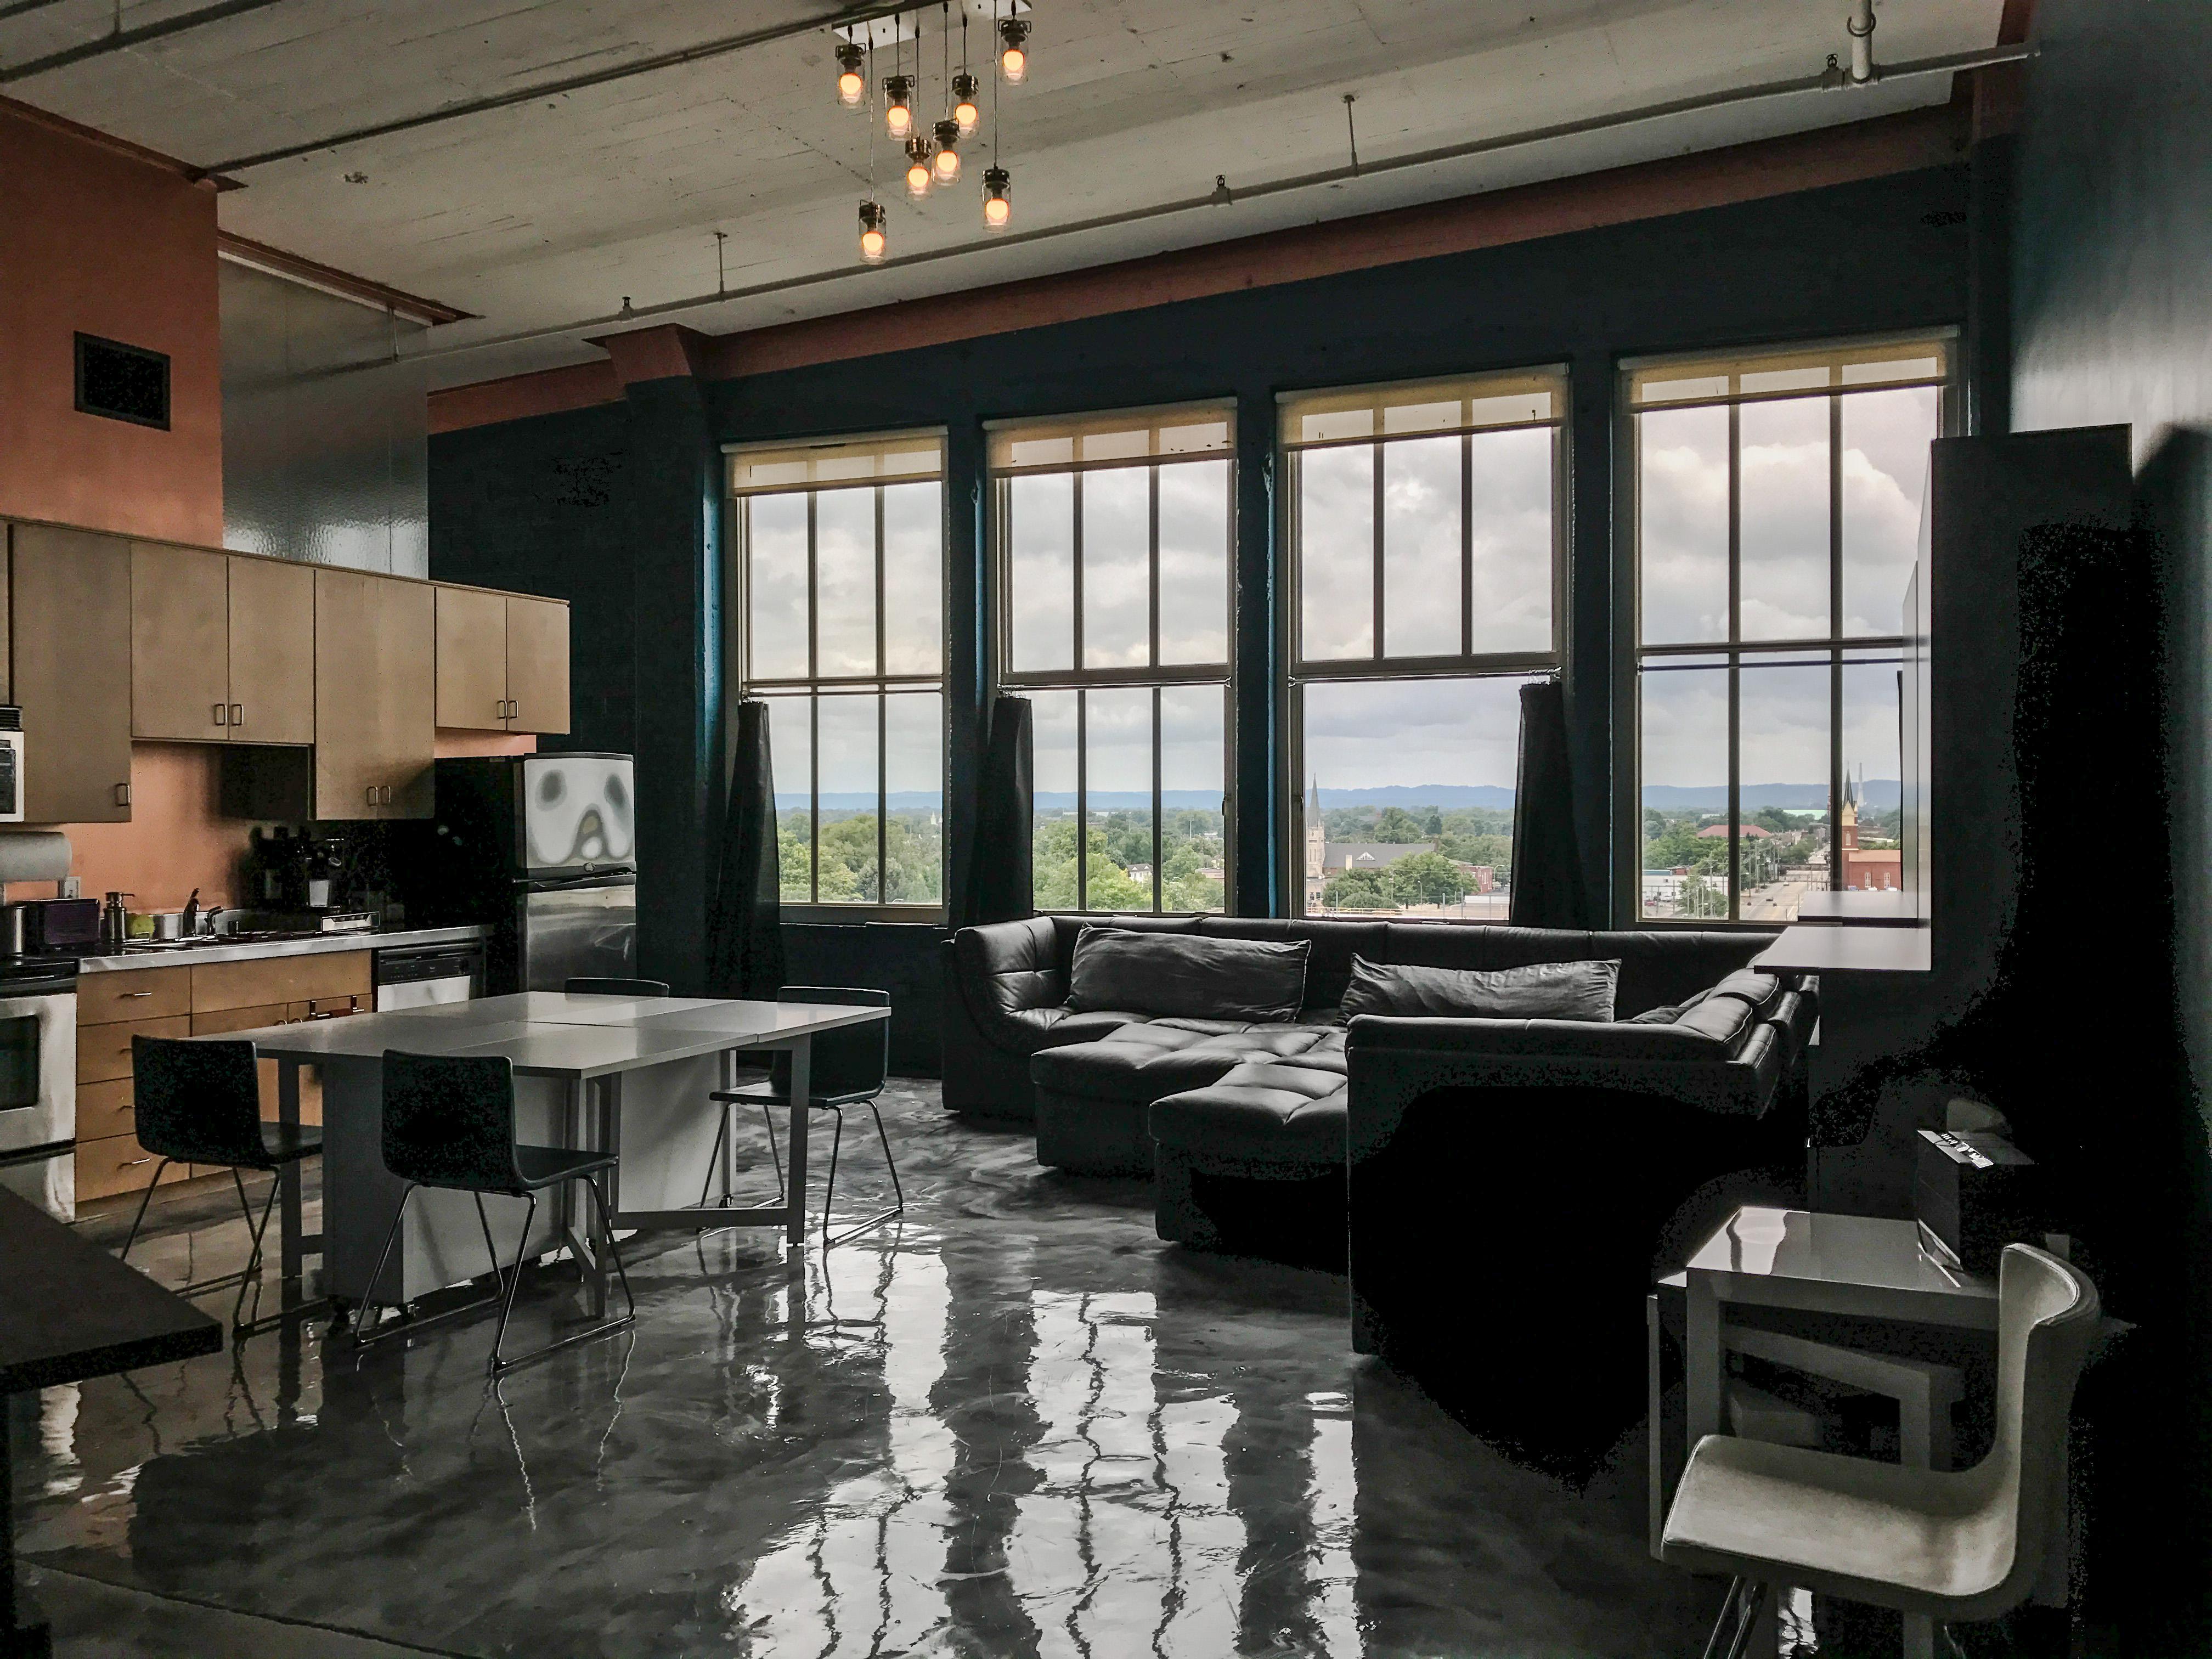 Loft Reverie Hotel 806 - Floyds Knob Hills + Downtown Louisville Views + Airy Open Floorplan